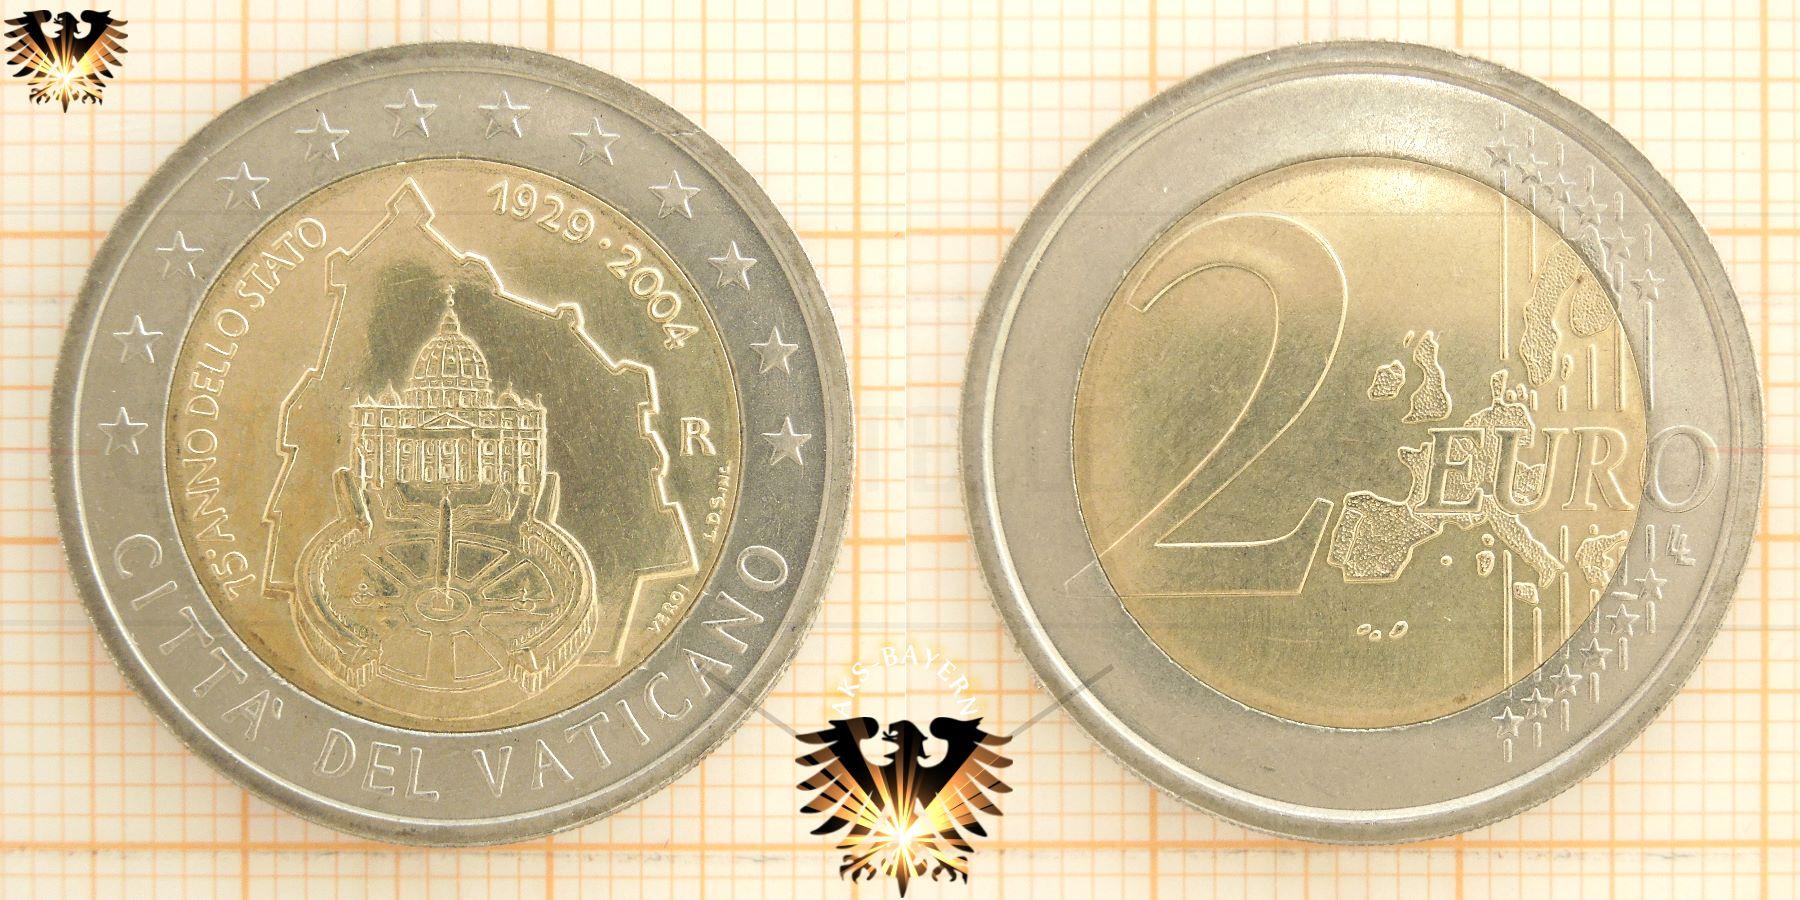 Vatikan Vatican Euro Sondermünzen Münzkatalog Vatikanstadt